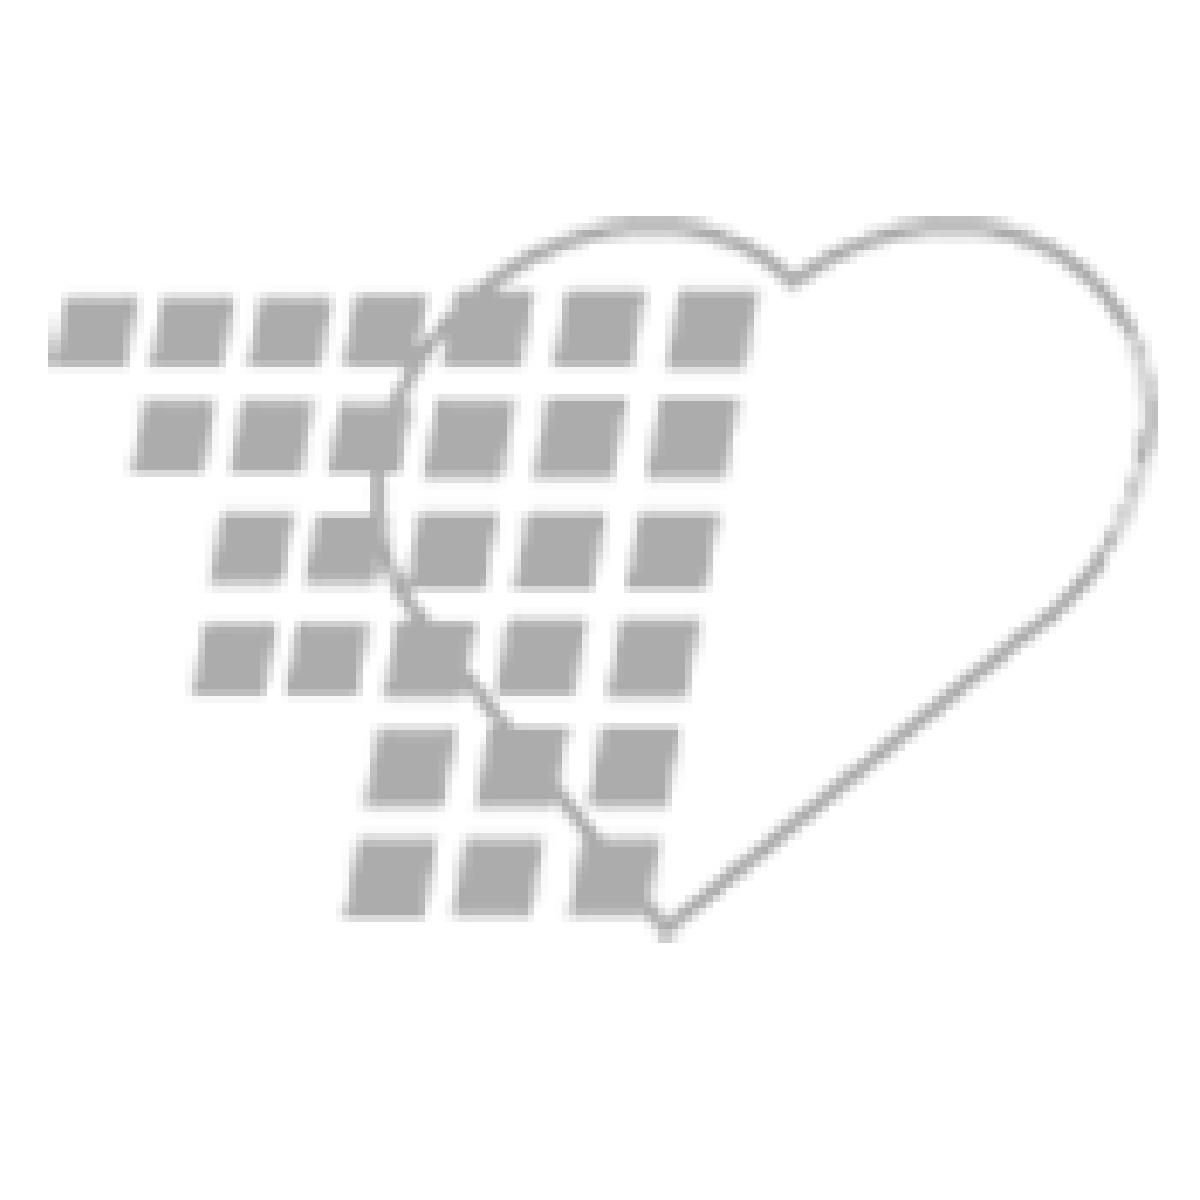 02-70-1254 - Graham Field Ishihara Test Chart - 14 Plates